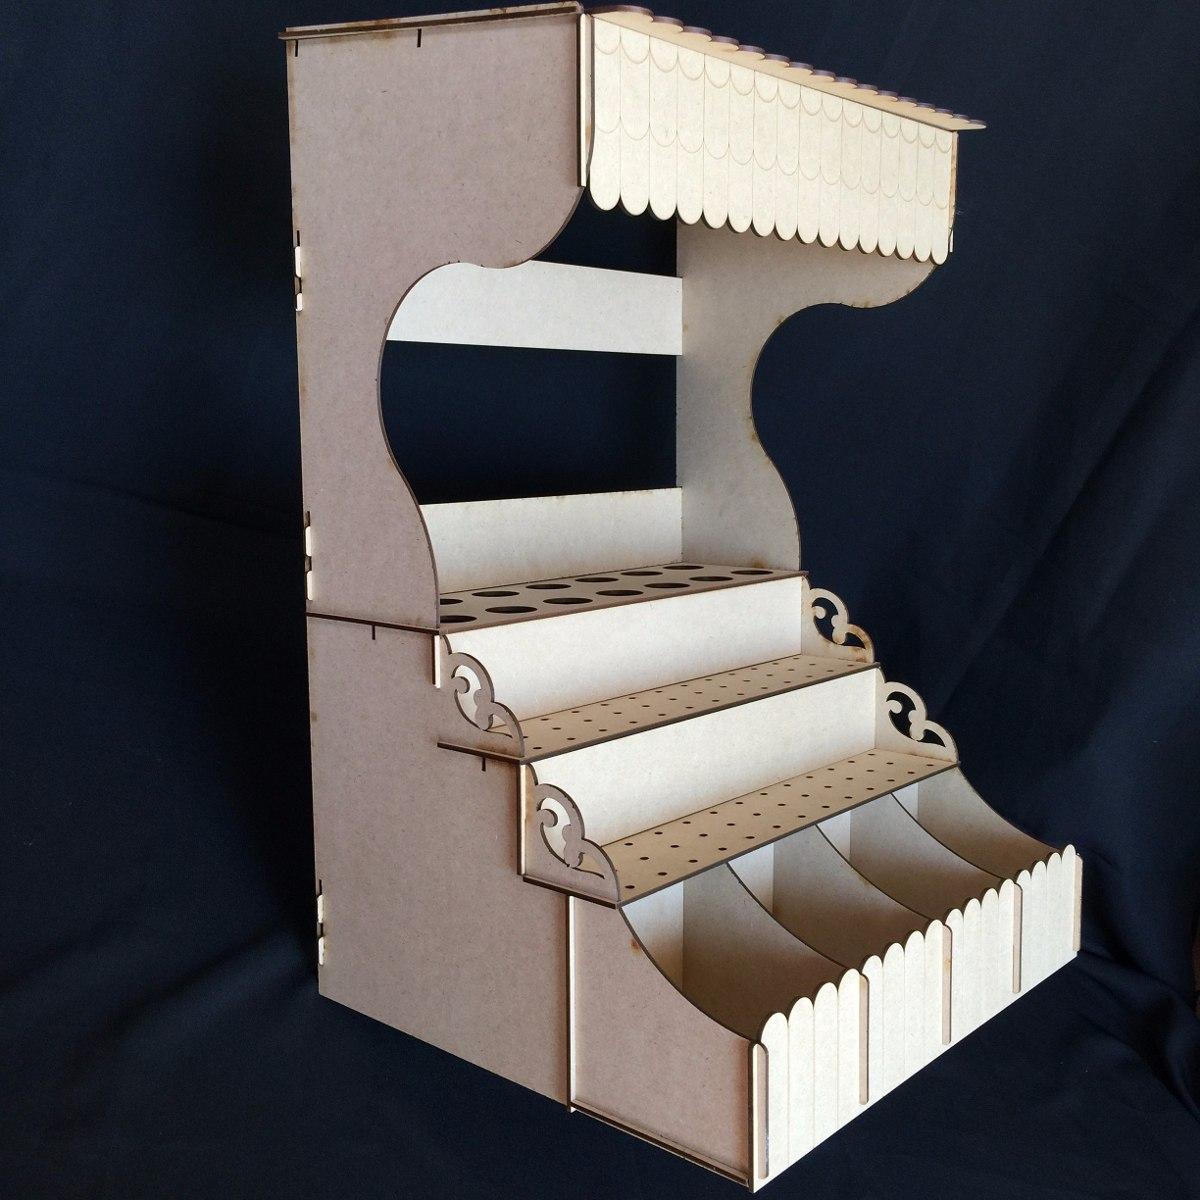 Quiosco para mesa de dulces y paletas base mdf gmbs025 for Imagenes de kioscos de madera